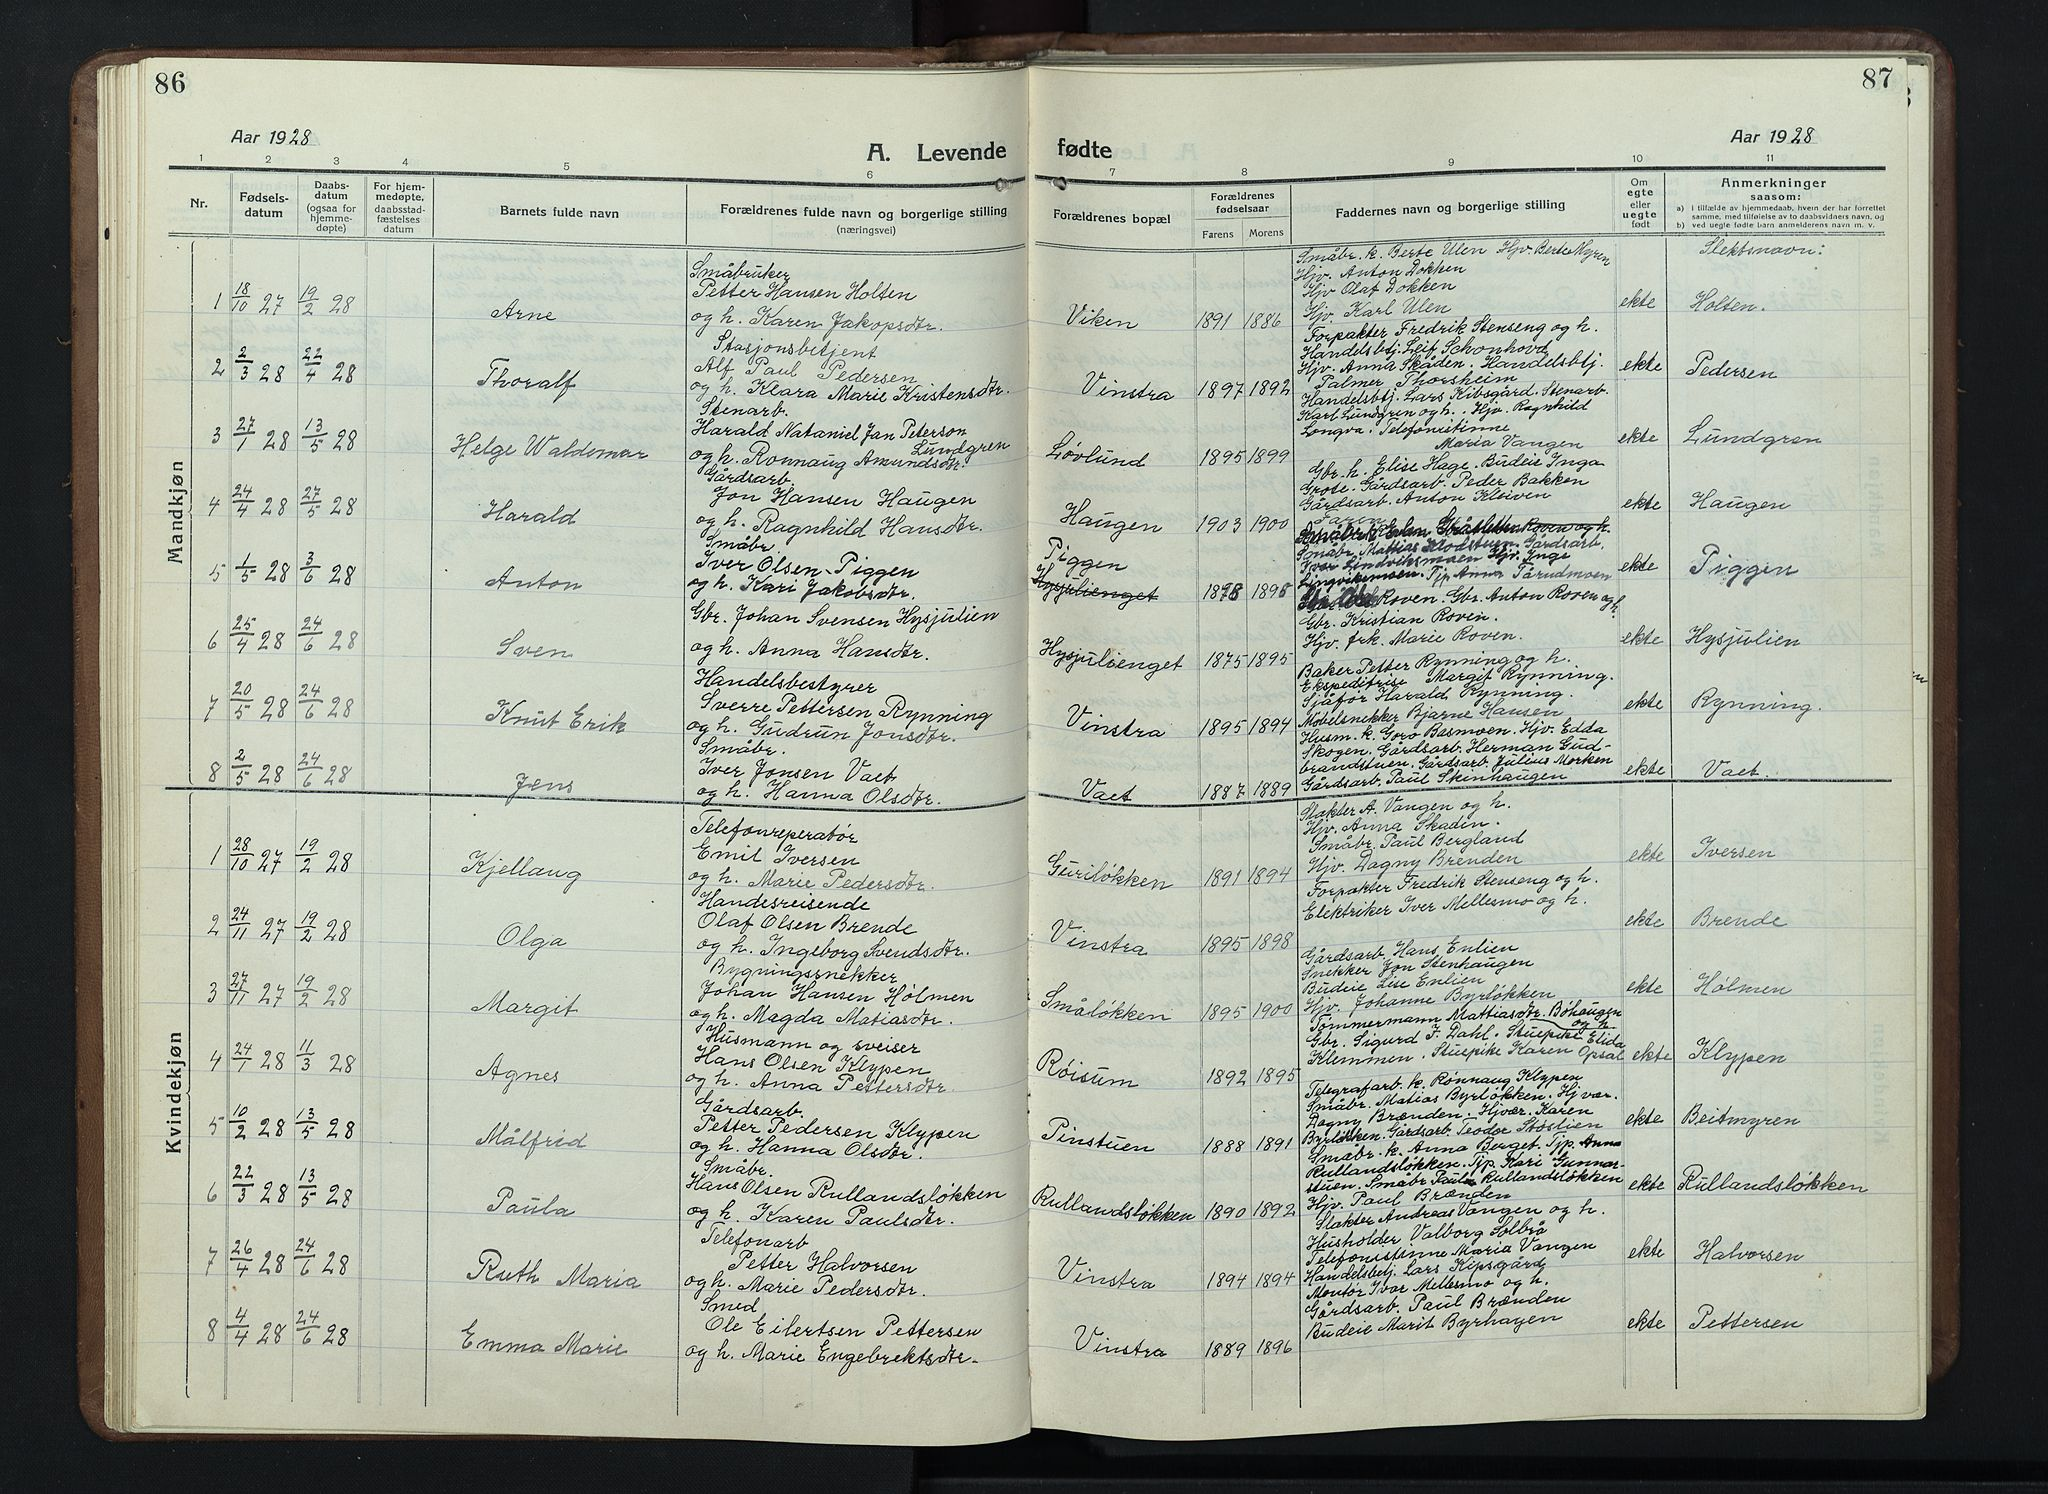 SAH, Nord-Fron prestekontor, Klokkerbok nr. 7, 1915-1946, s. 86-87